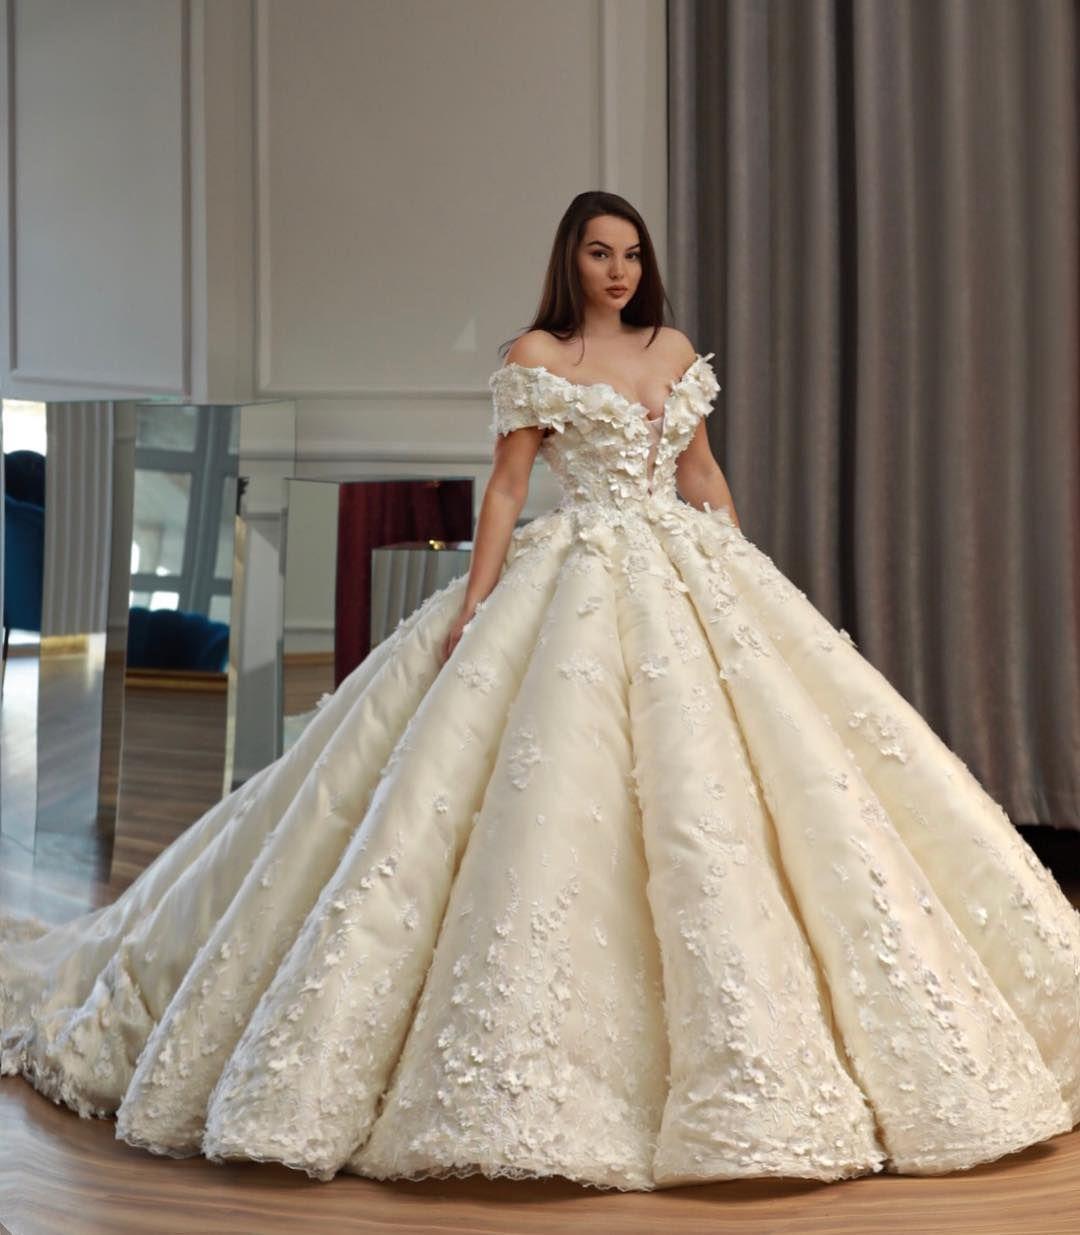 Best Ball Gown Wedding Dresses: 2019 Luxury Arabic Dubai Plus Size Lace Ball Gown Wedding